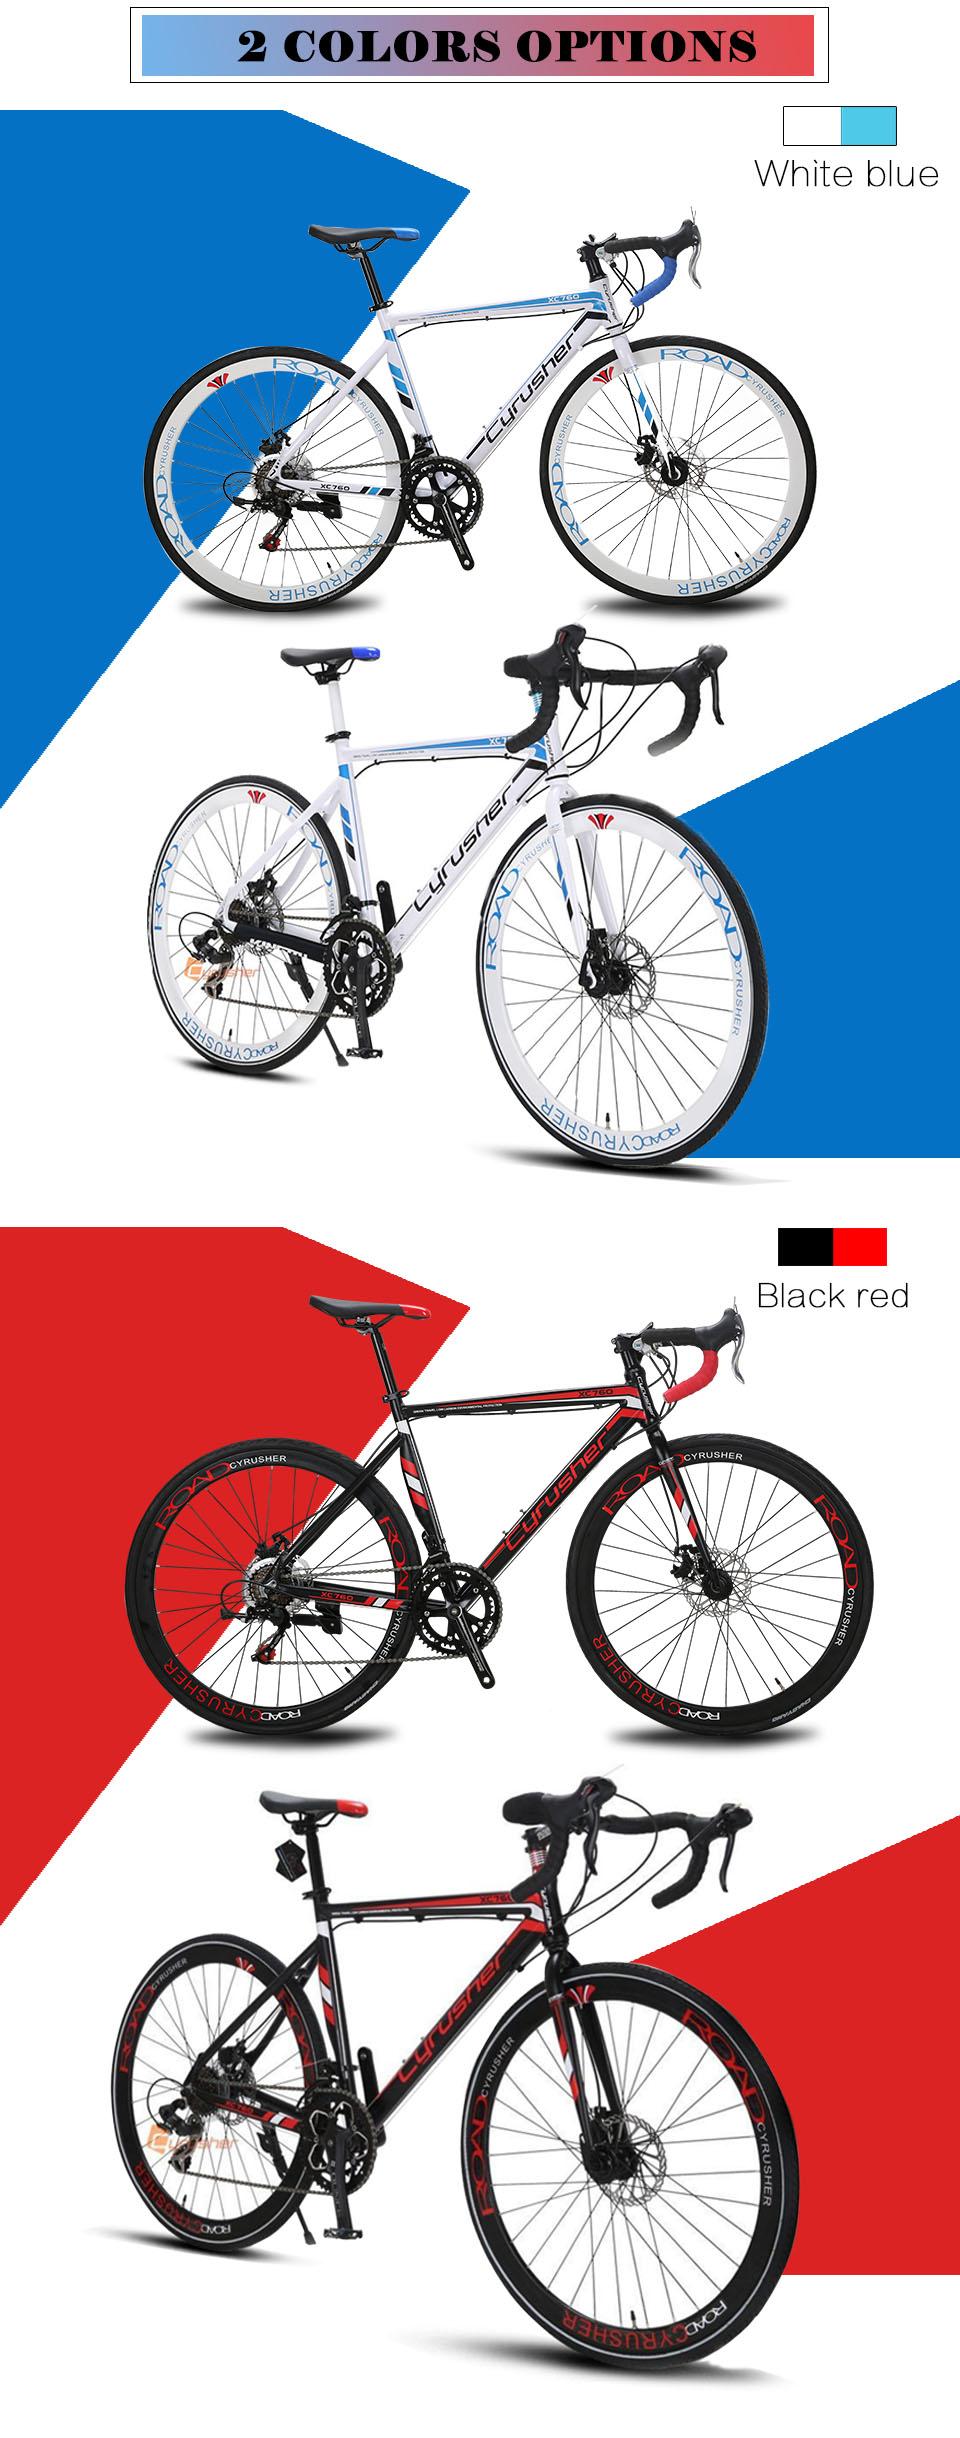 Cyrusher City Road Bike | Aluminum Alloy Frame 14 Speeds Double Disc Brake